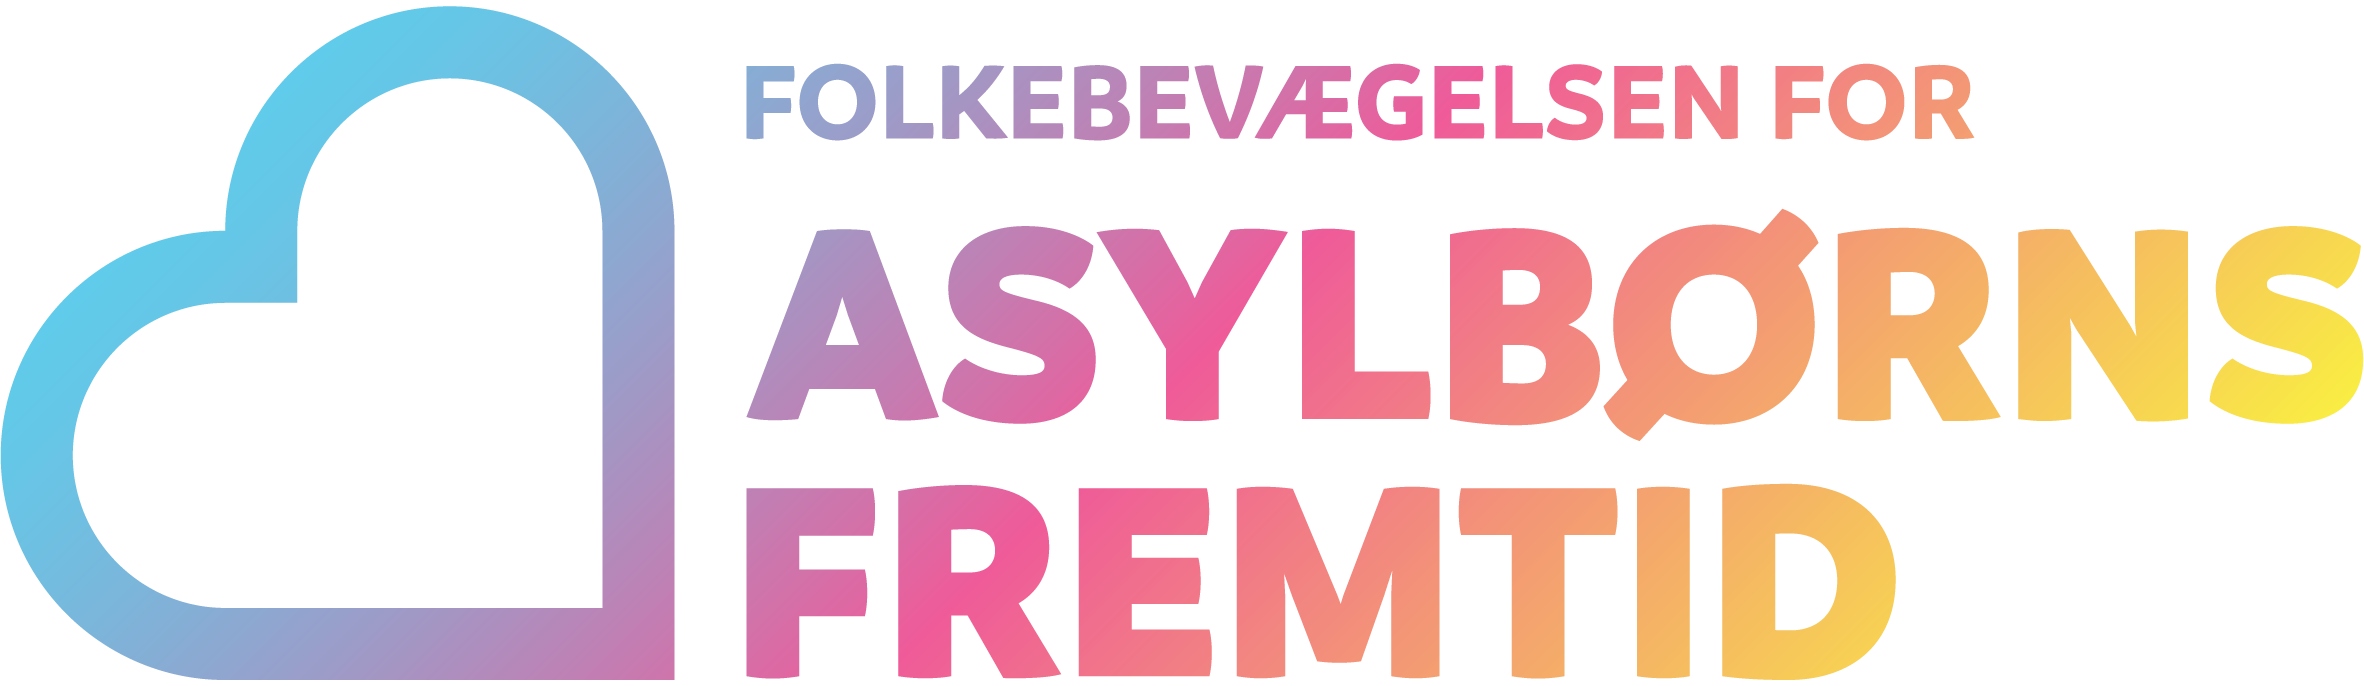 alsymbornsfremtid_logo_RGB_Artboard 1.png